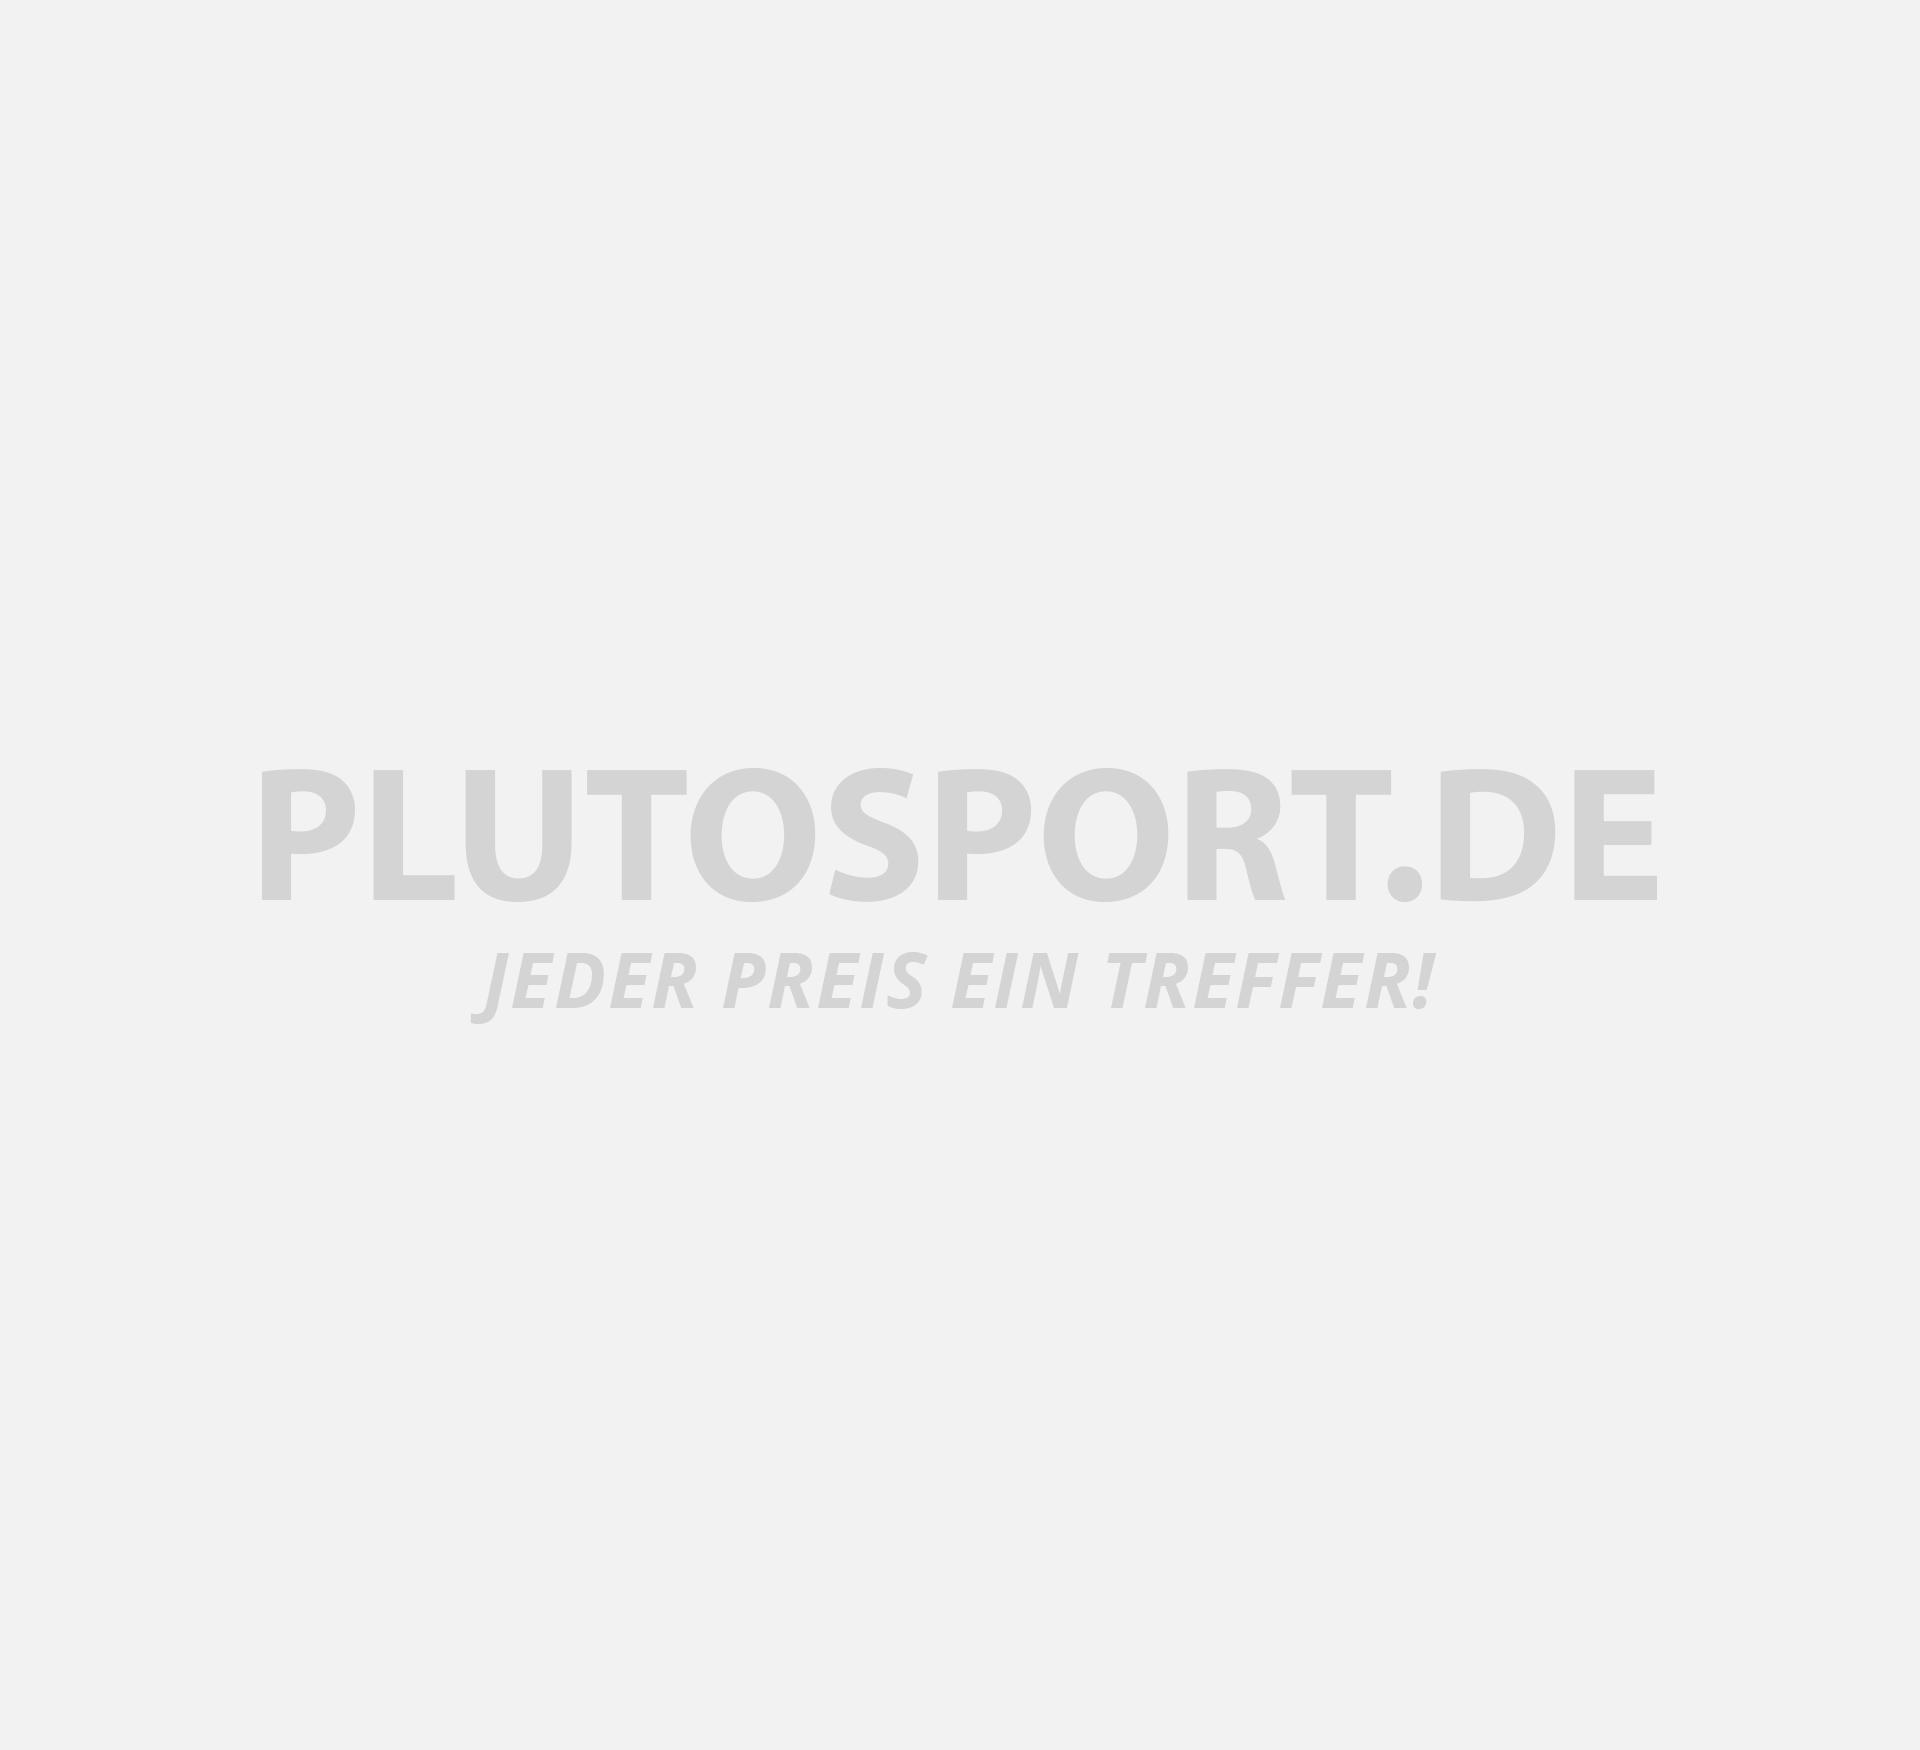 new concept 6ddba 4c7ab Lacoste Sport Trainingsanzug Herren spotlightstranscom.de